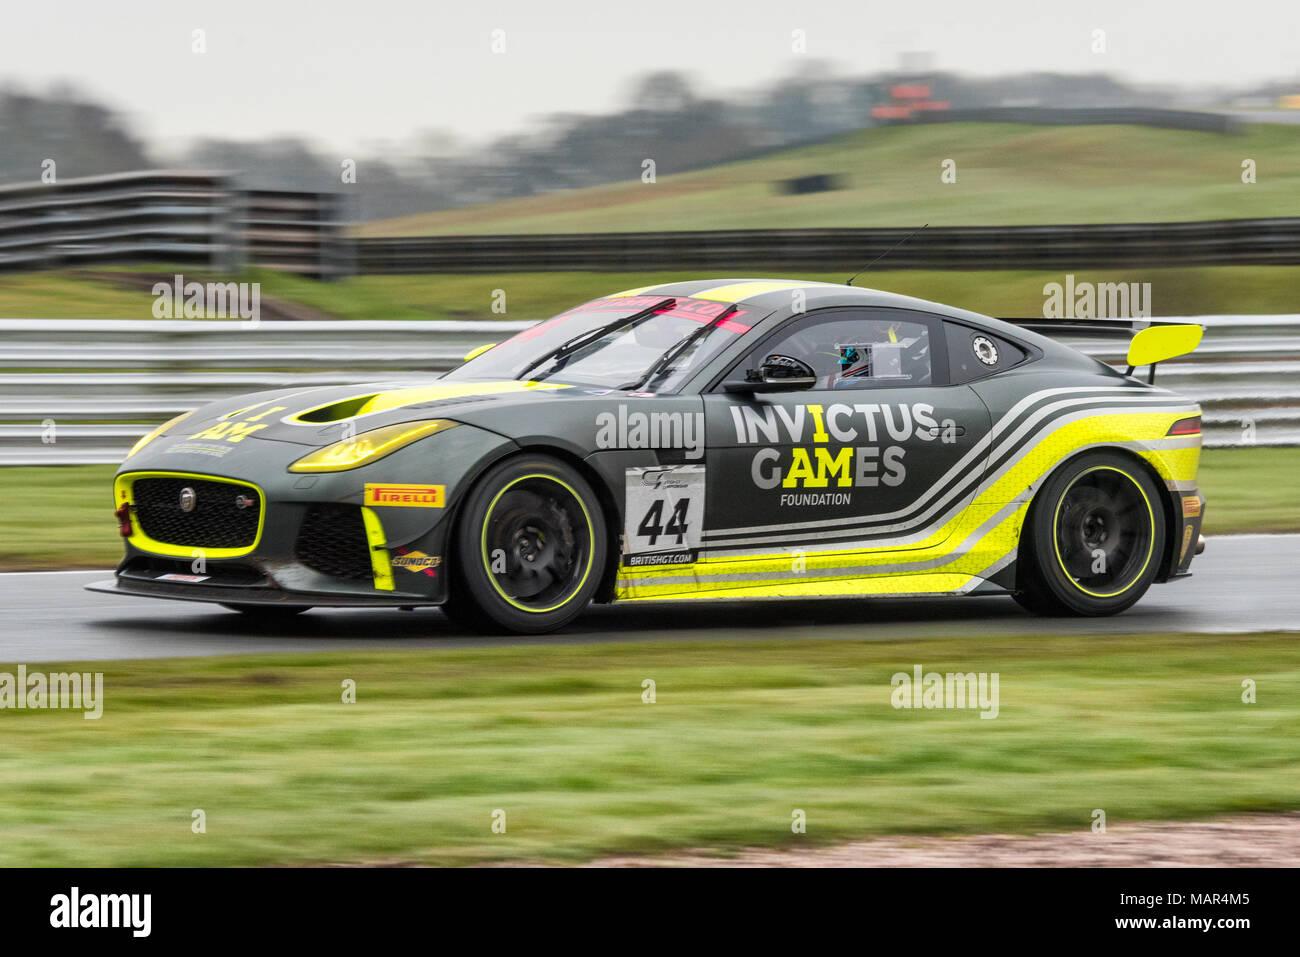 Invictus Games Racing Jaguar F-Type SVR GT4 Car 44 during round 1 of